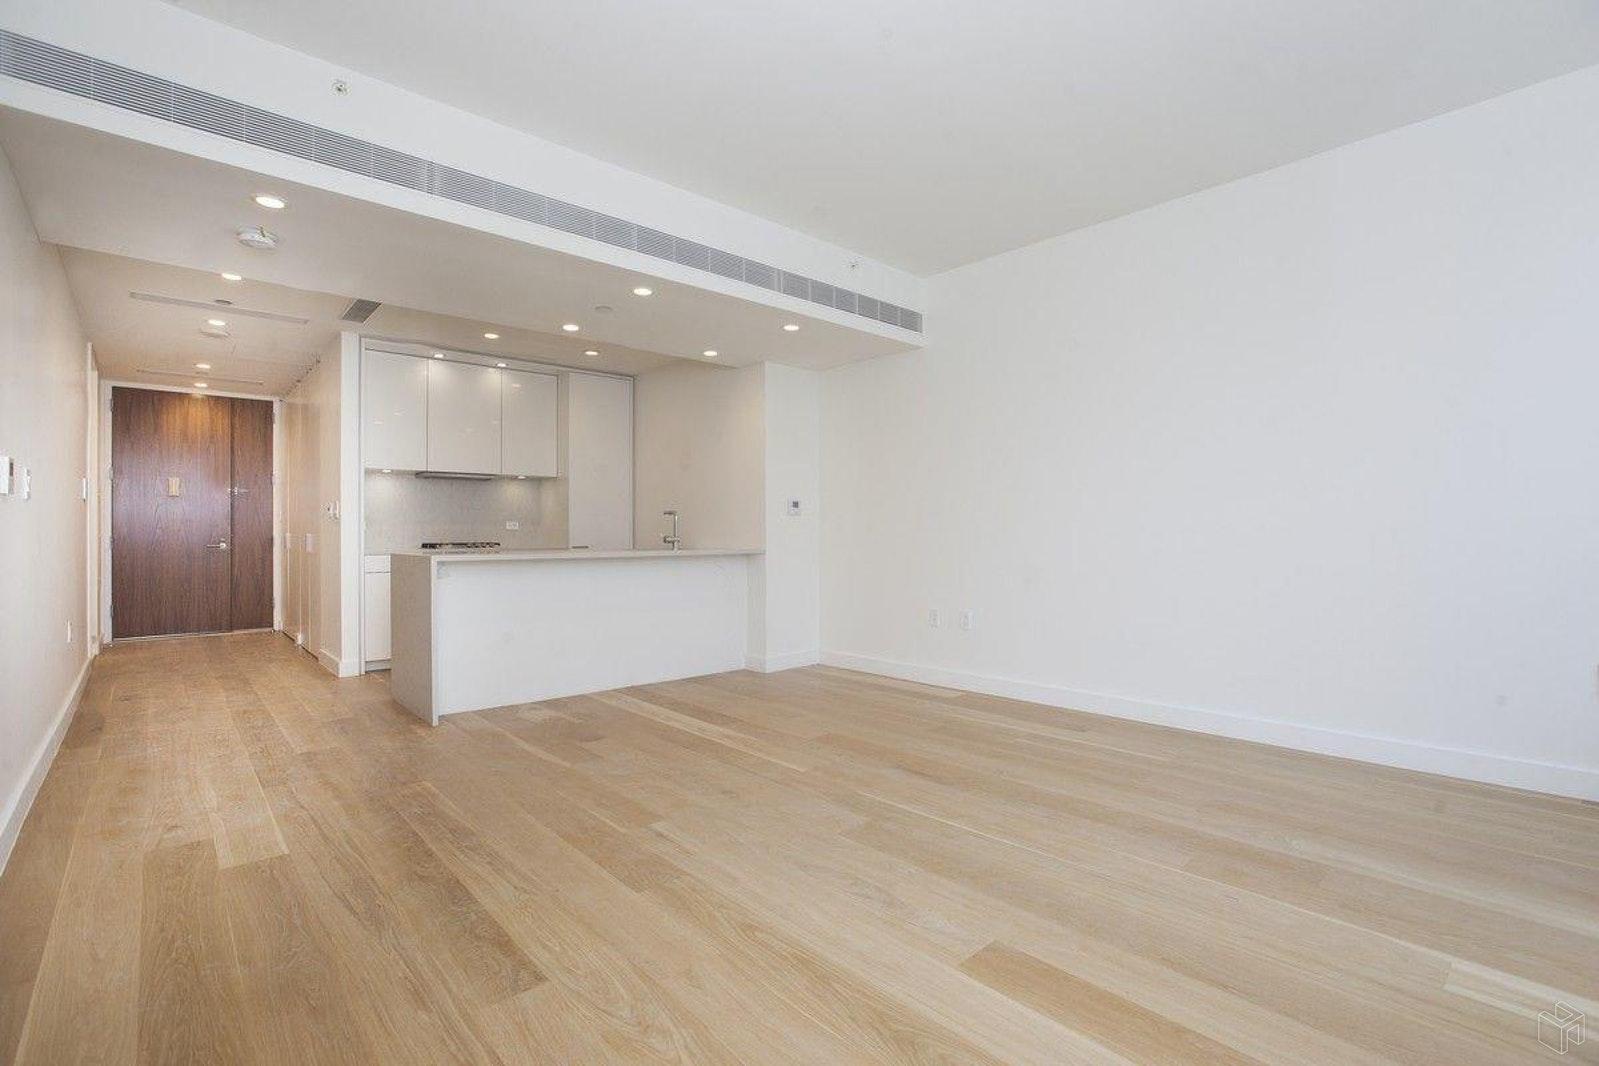 301 East 61st Street, 6C New York, NY 10065 | Sotheby's